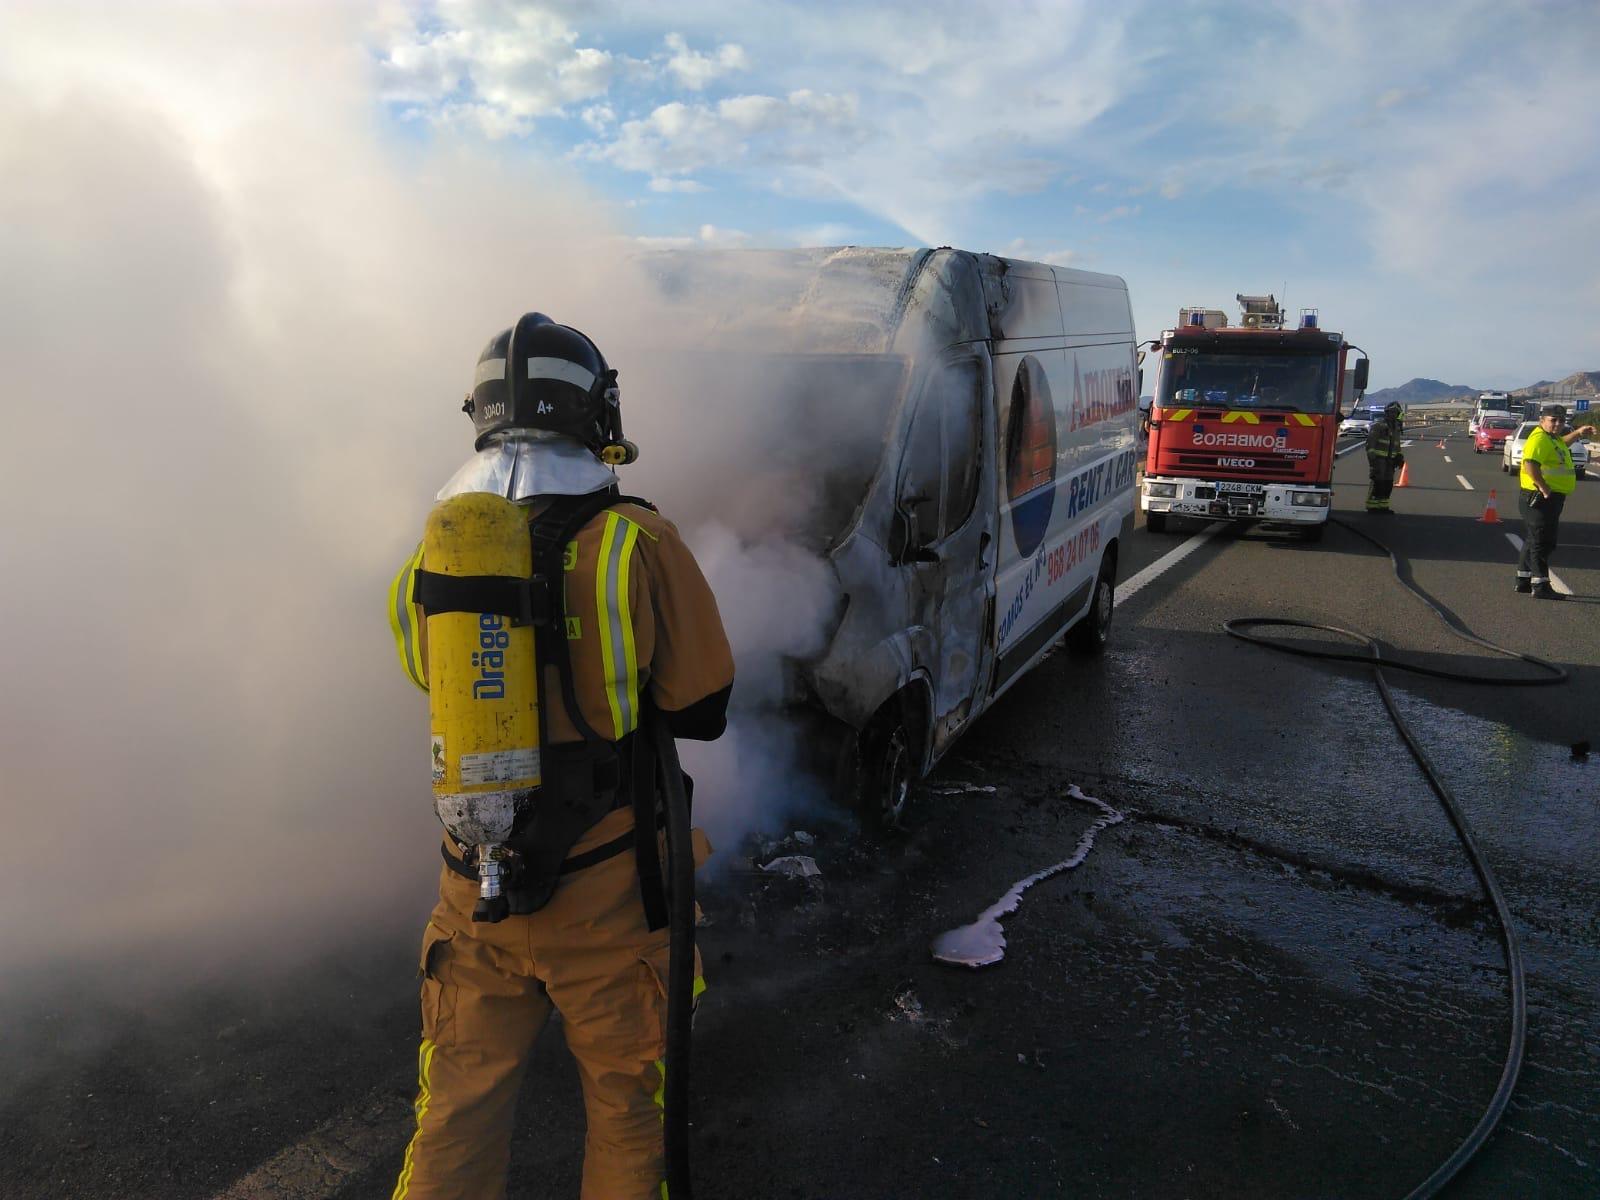 se-incendia-una-furgoneta-autovia-a-30-cieza